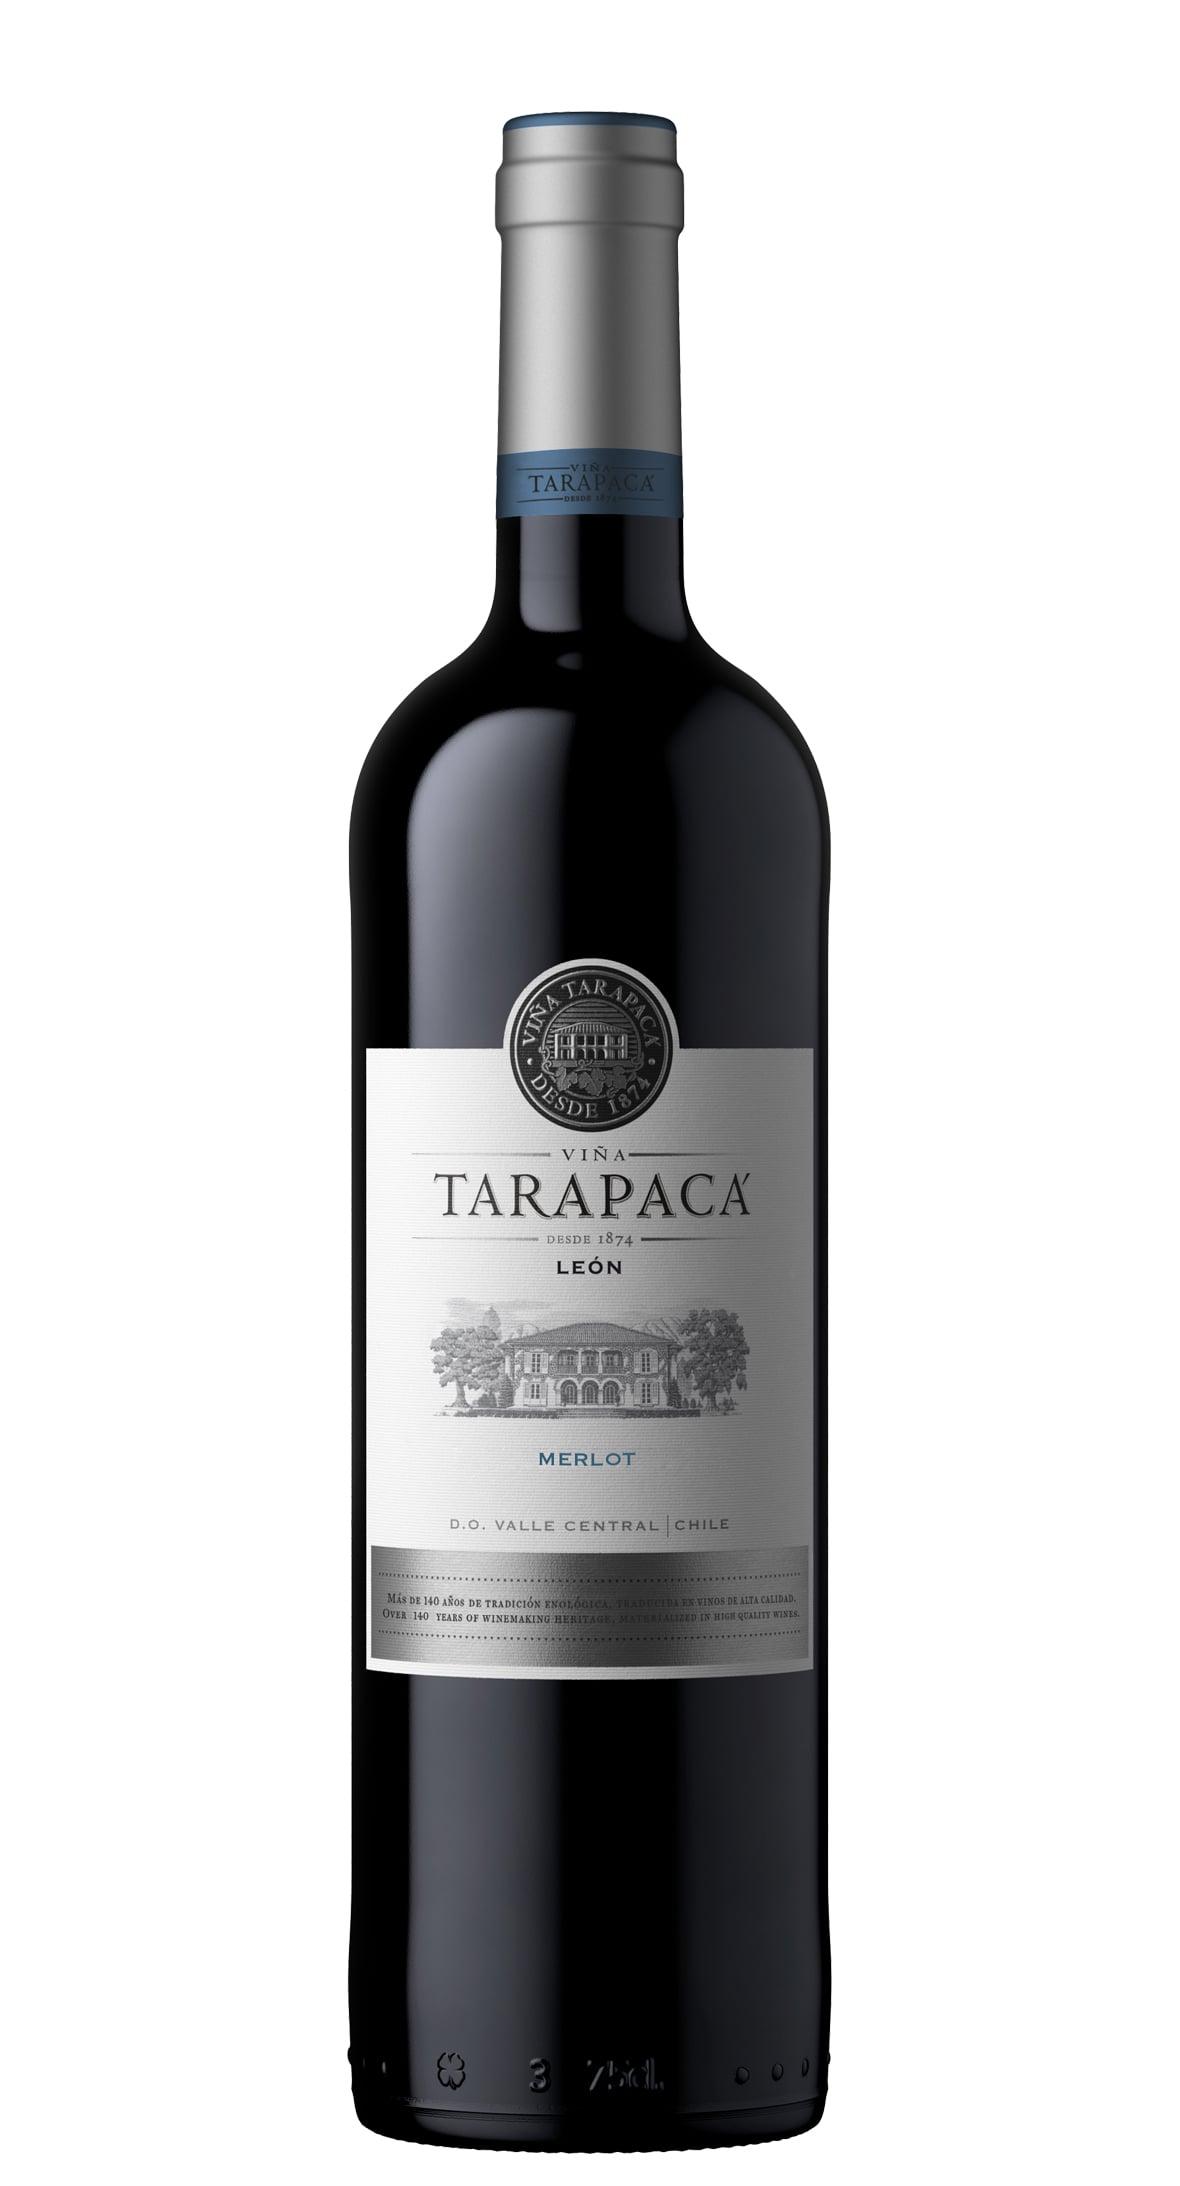 Vinho Tarapaca Leon Merlot 2018 750ml